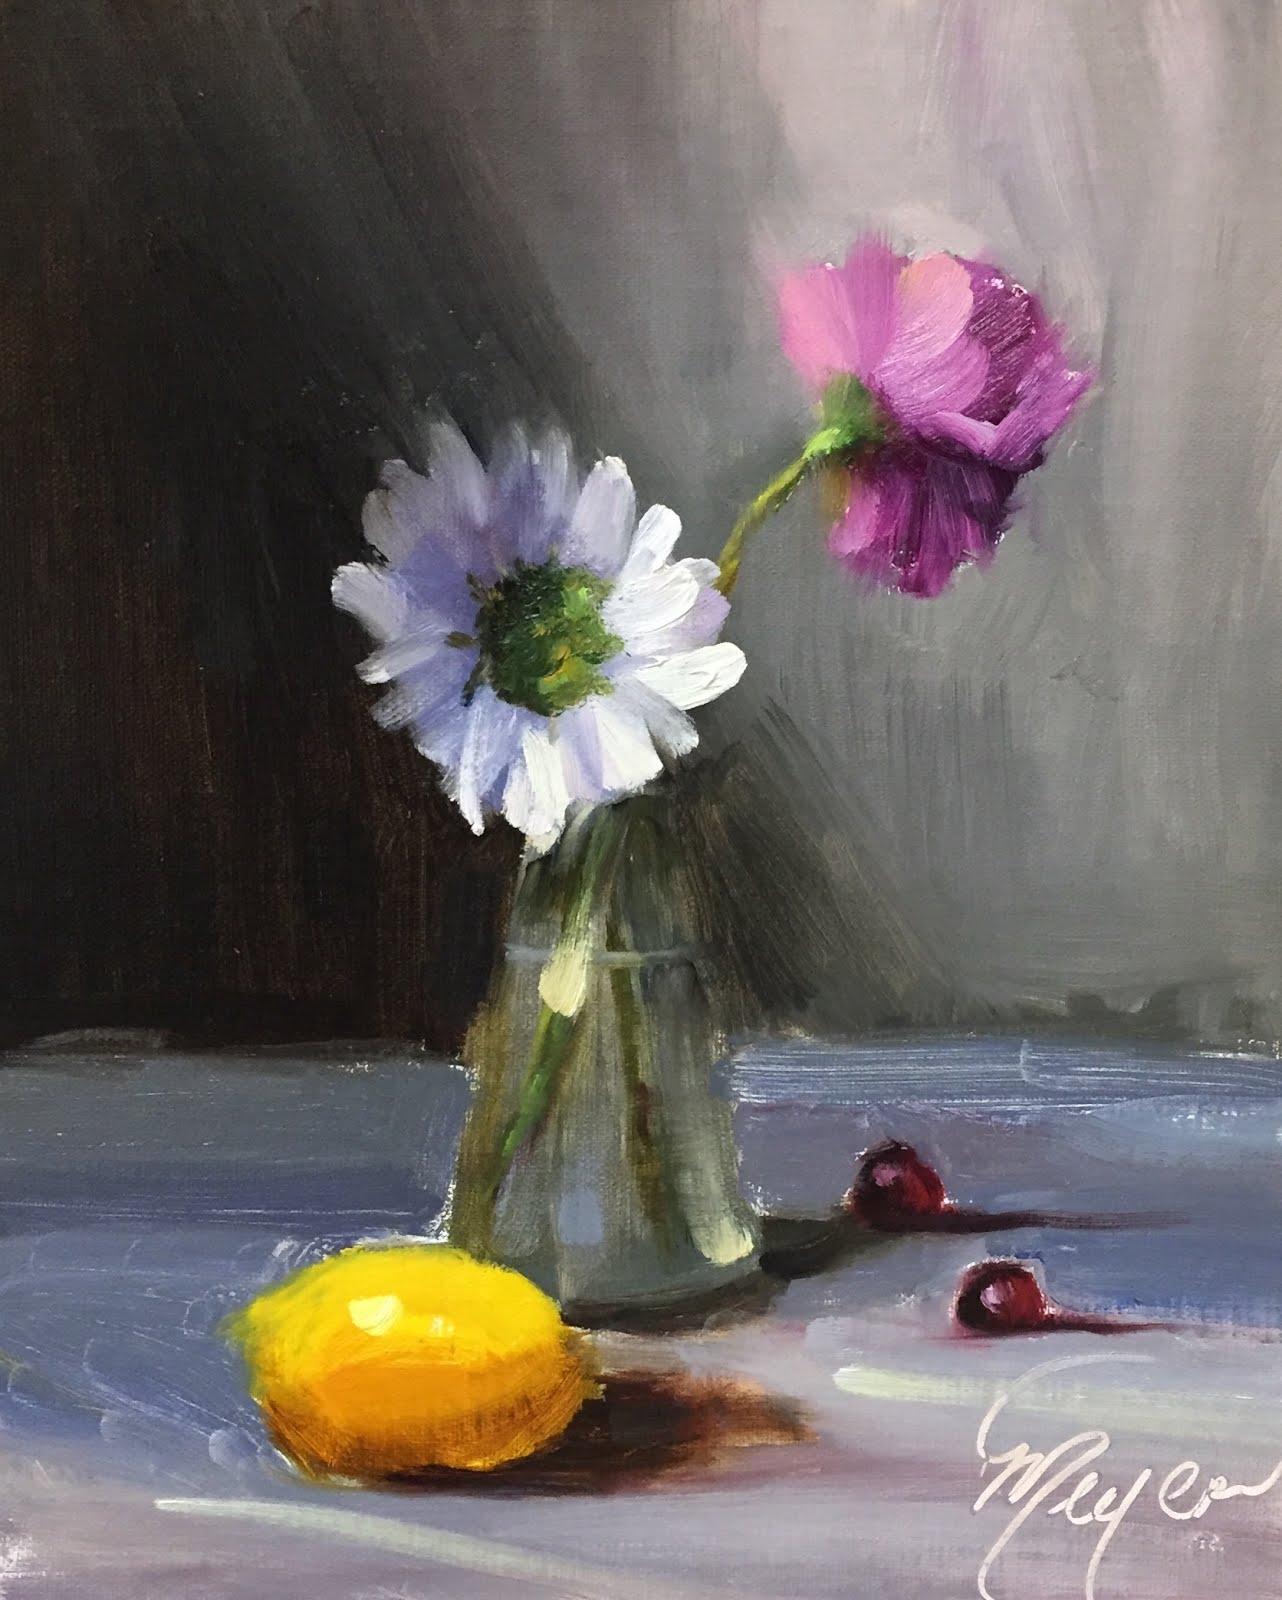 Beginner Oil Painting Class Demo By Artist Pat Meyer